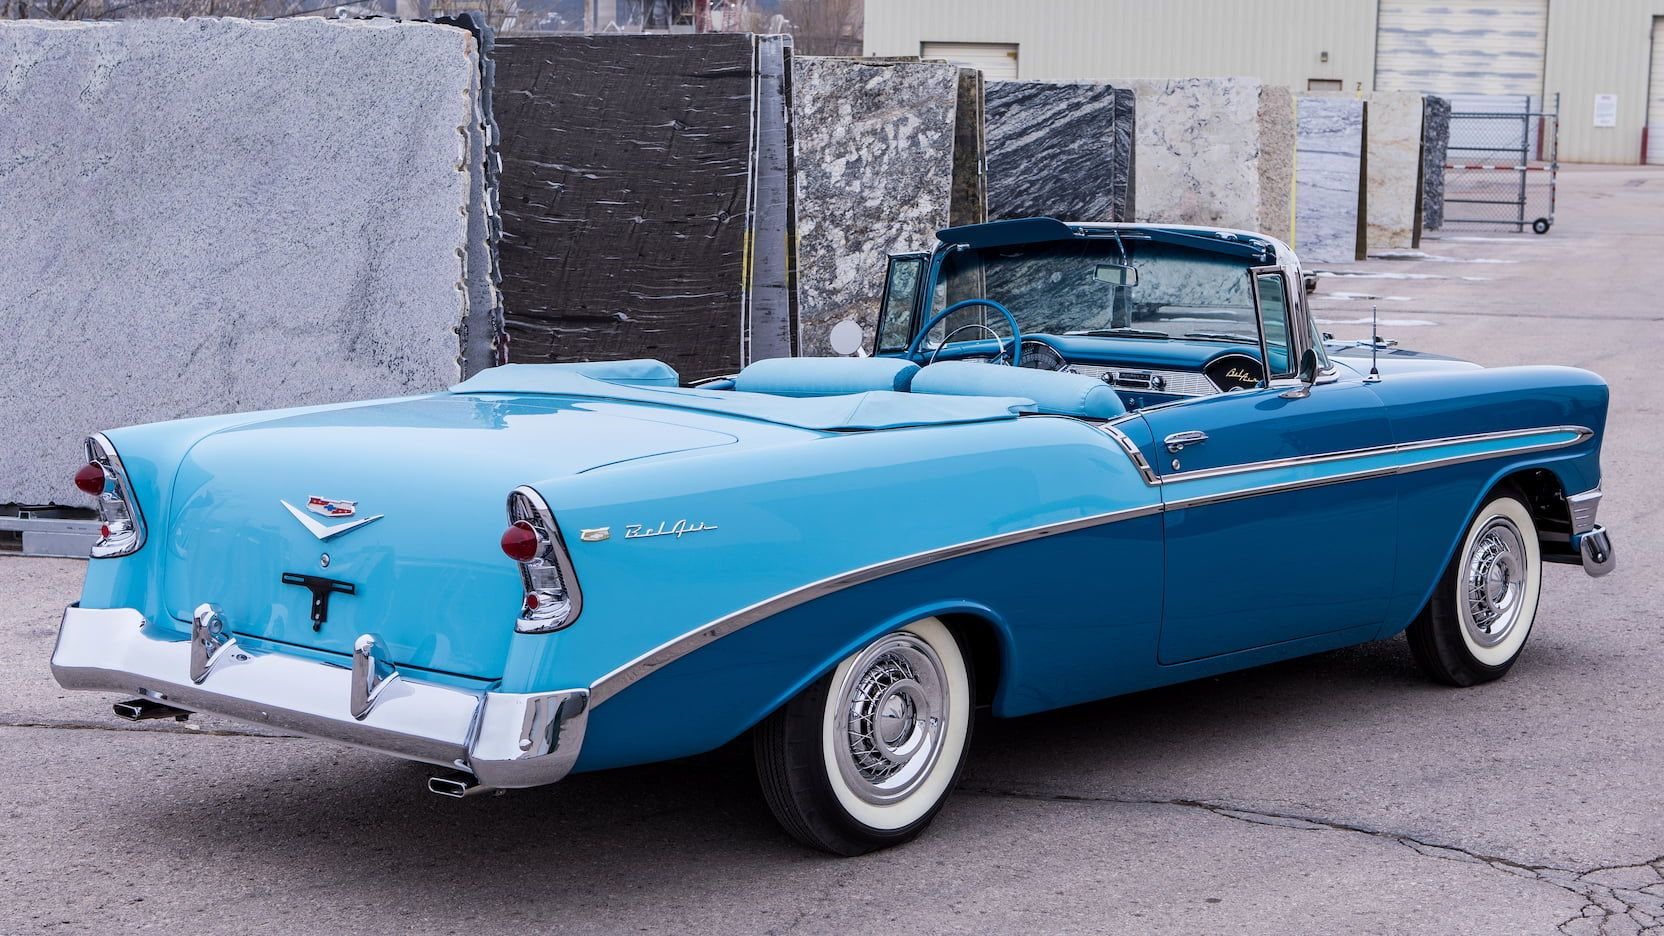 1956 Chevrolet Bel Air Convertible Classic Cars Cool Old Cars Chevrolet Bel Air